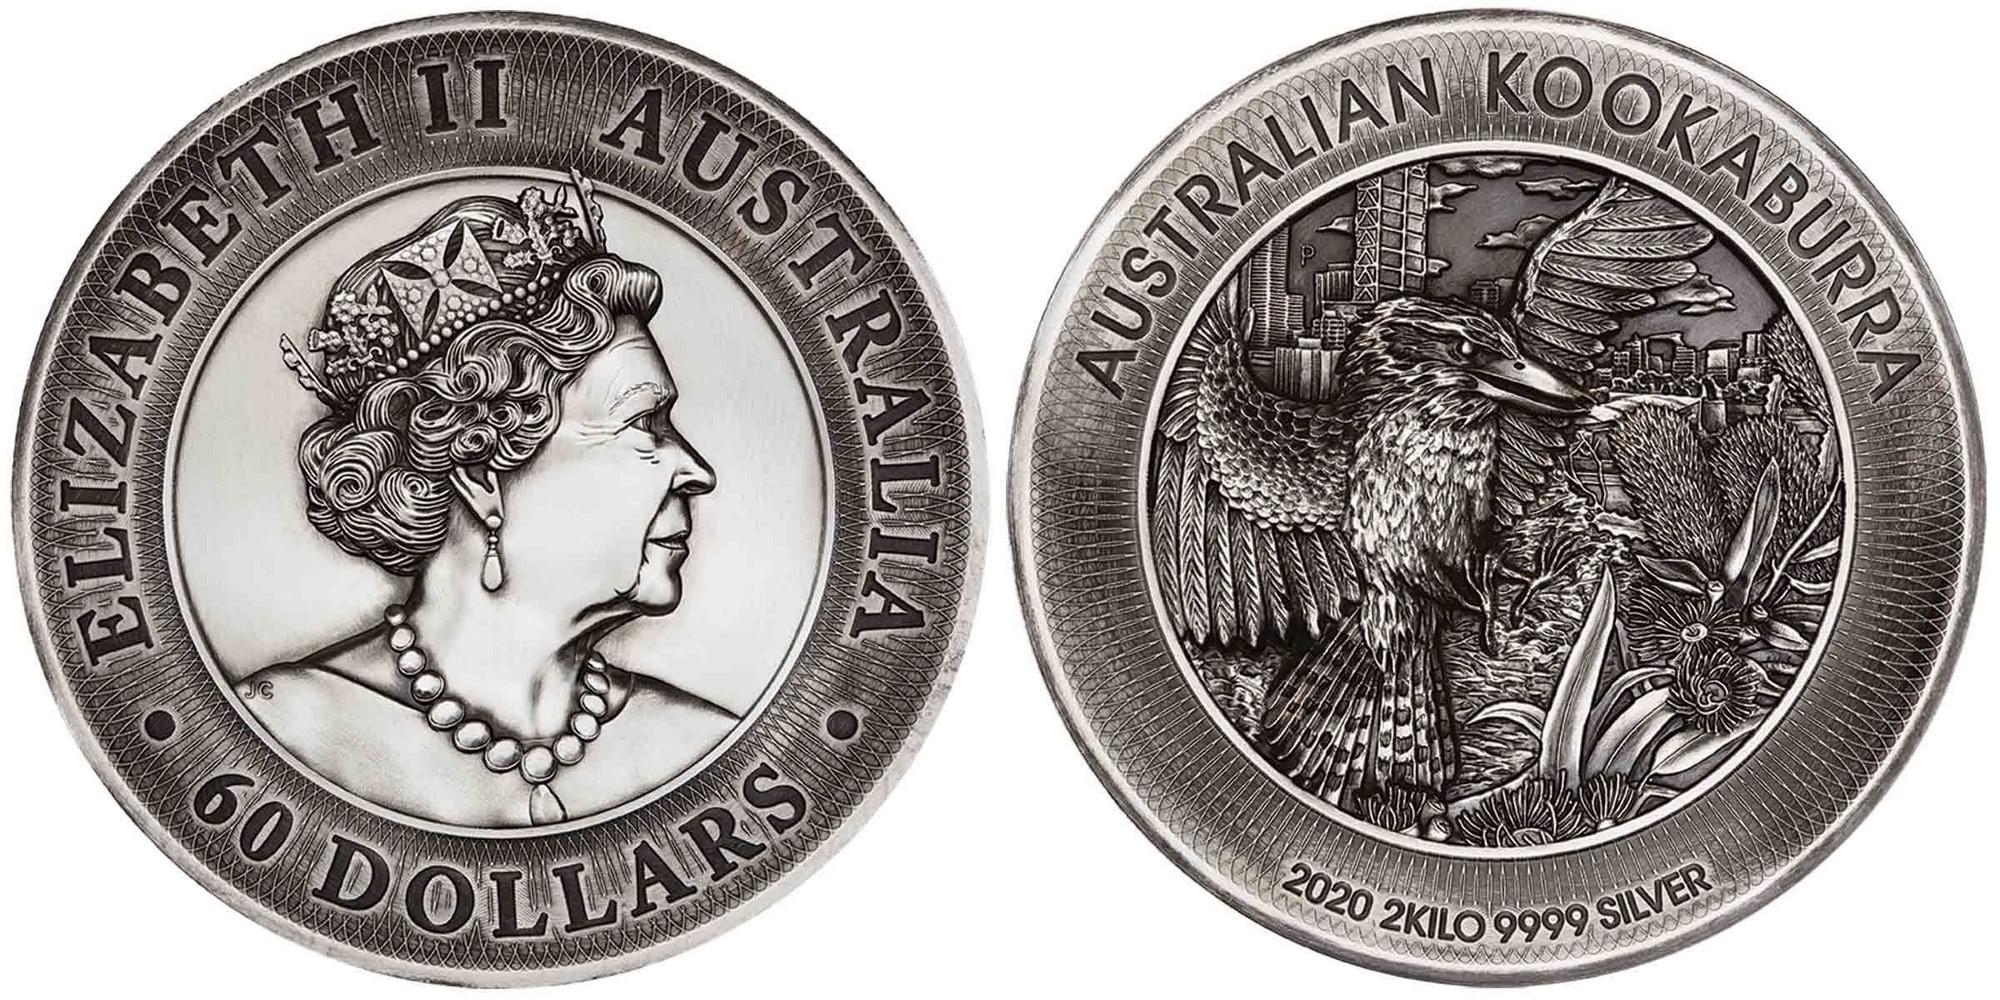 australie-2020-kookaburra-2-kg